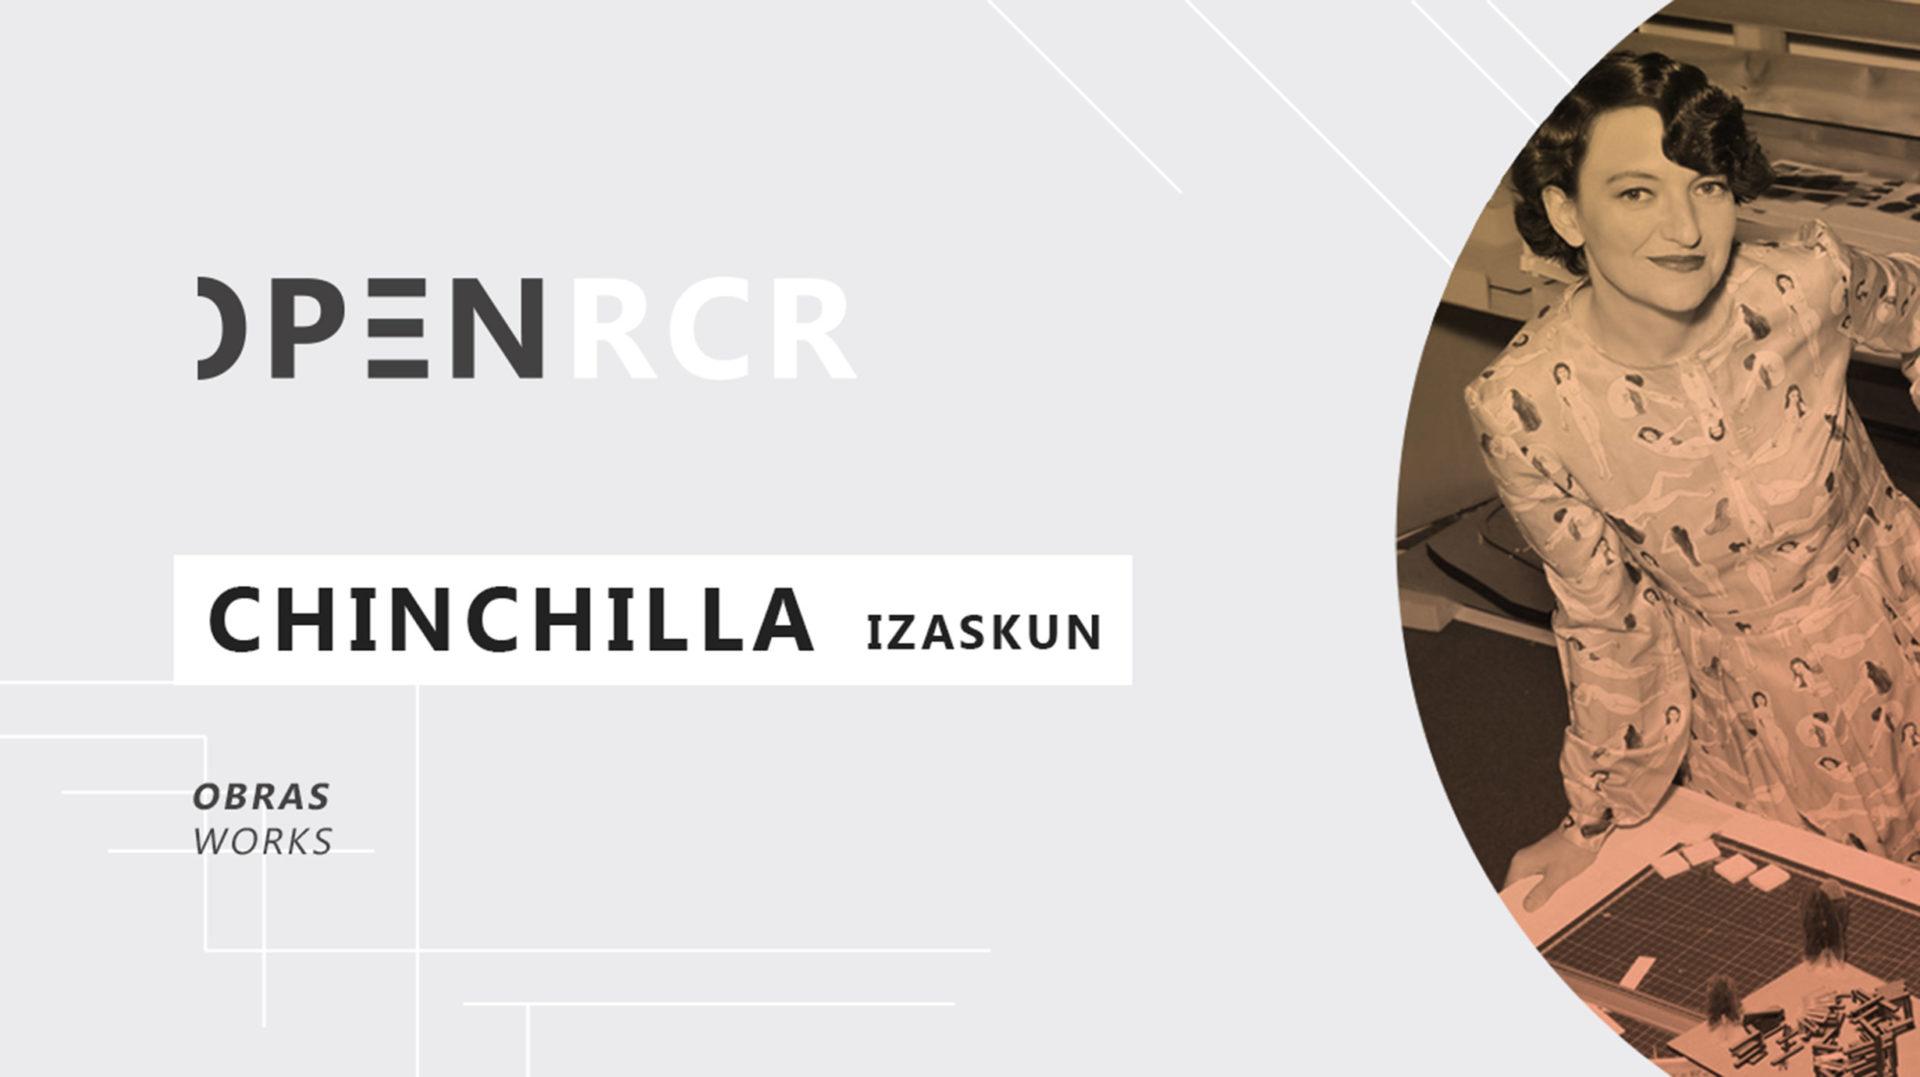 Izaskun Chinchilla